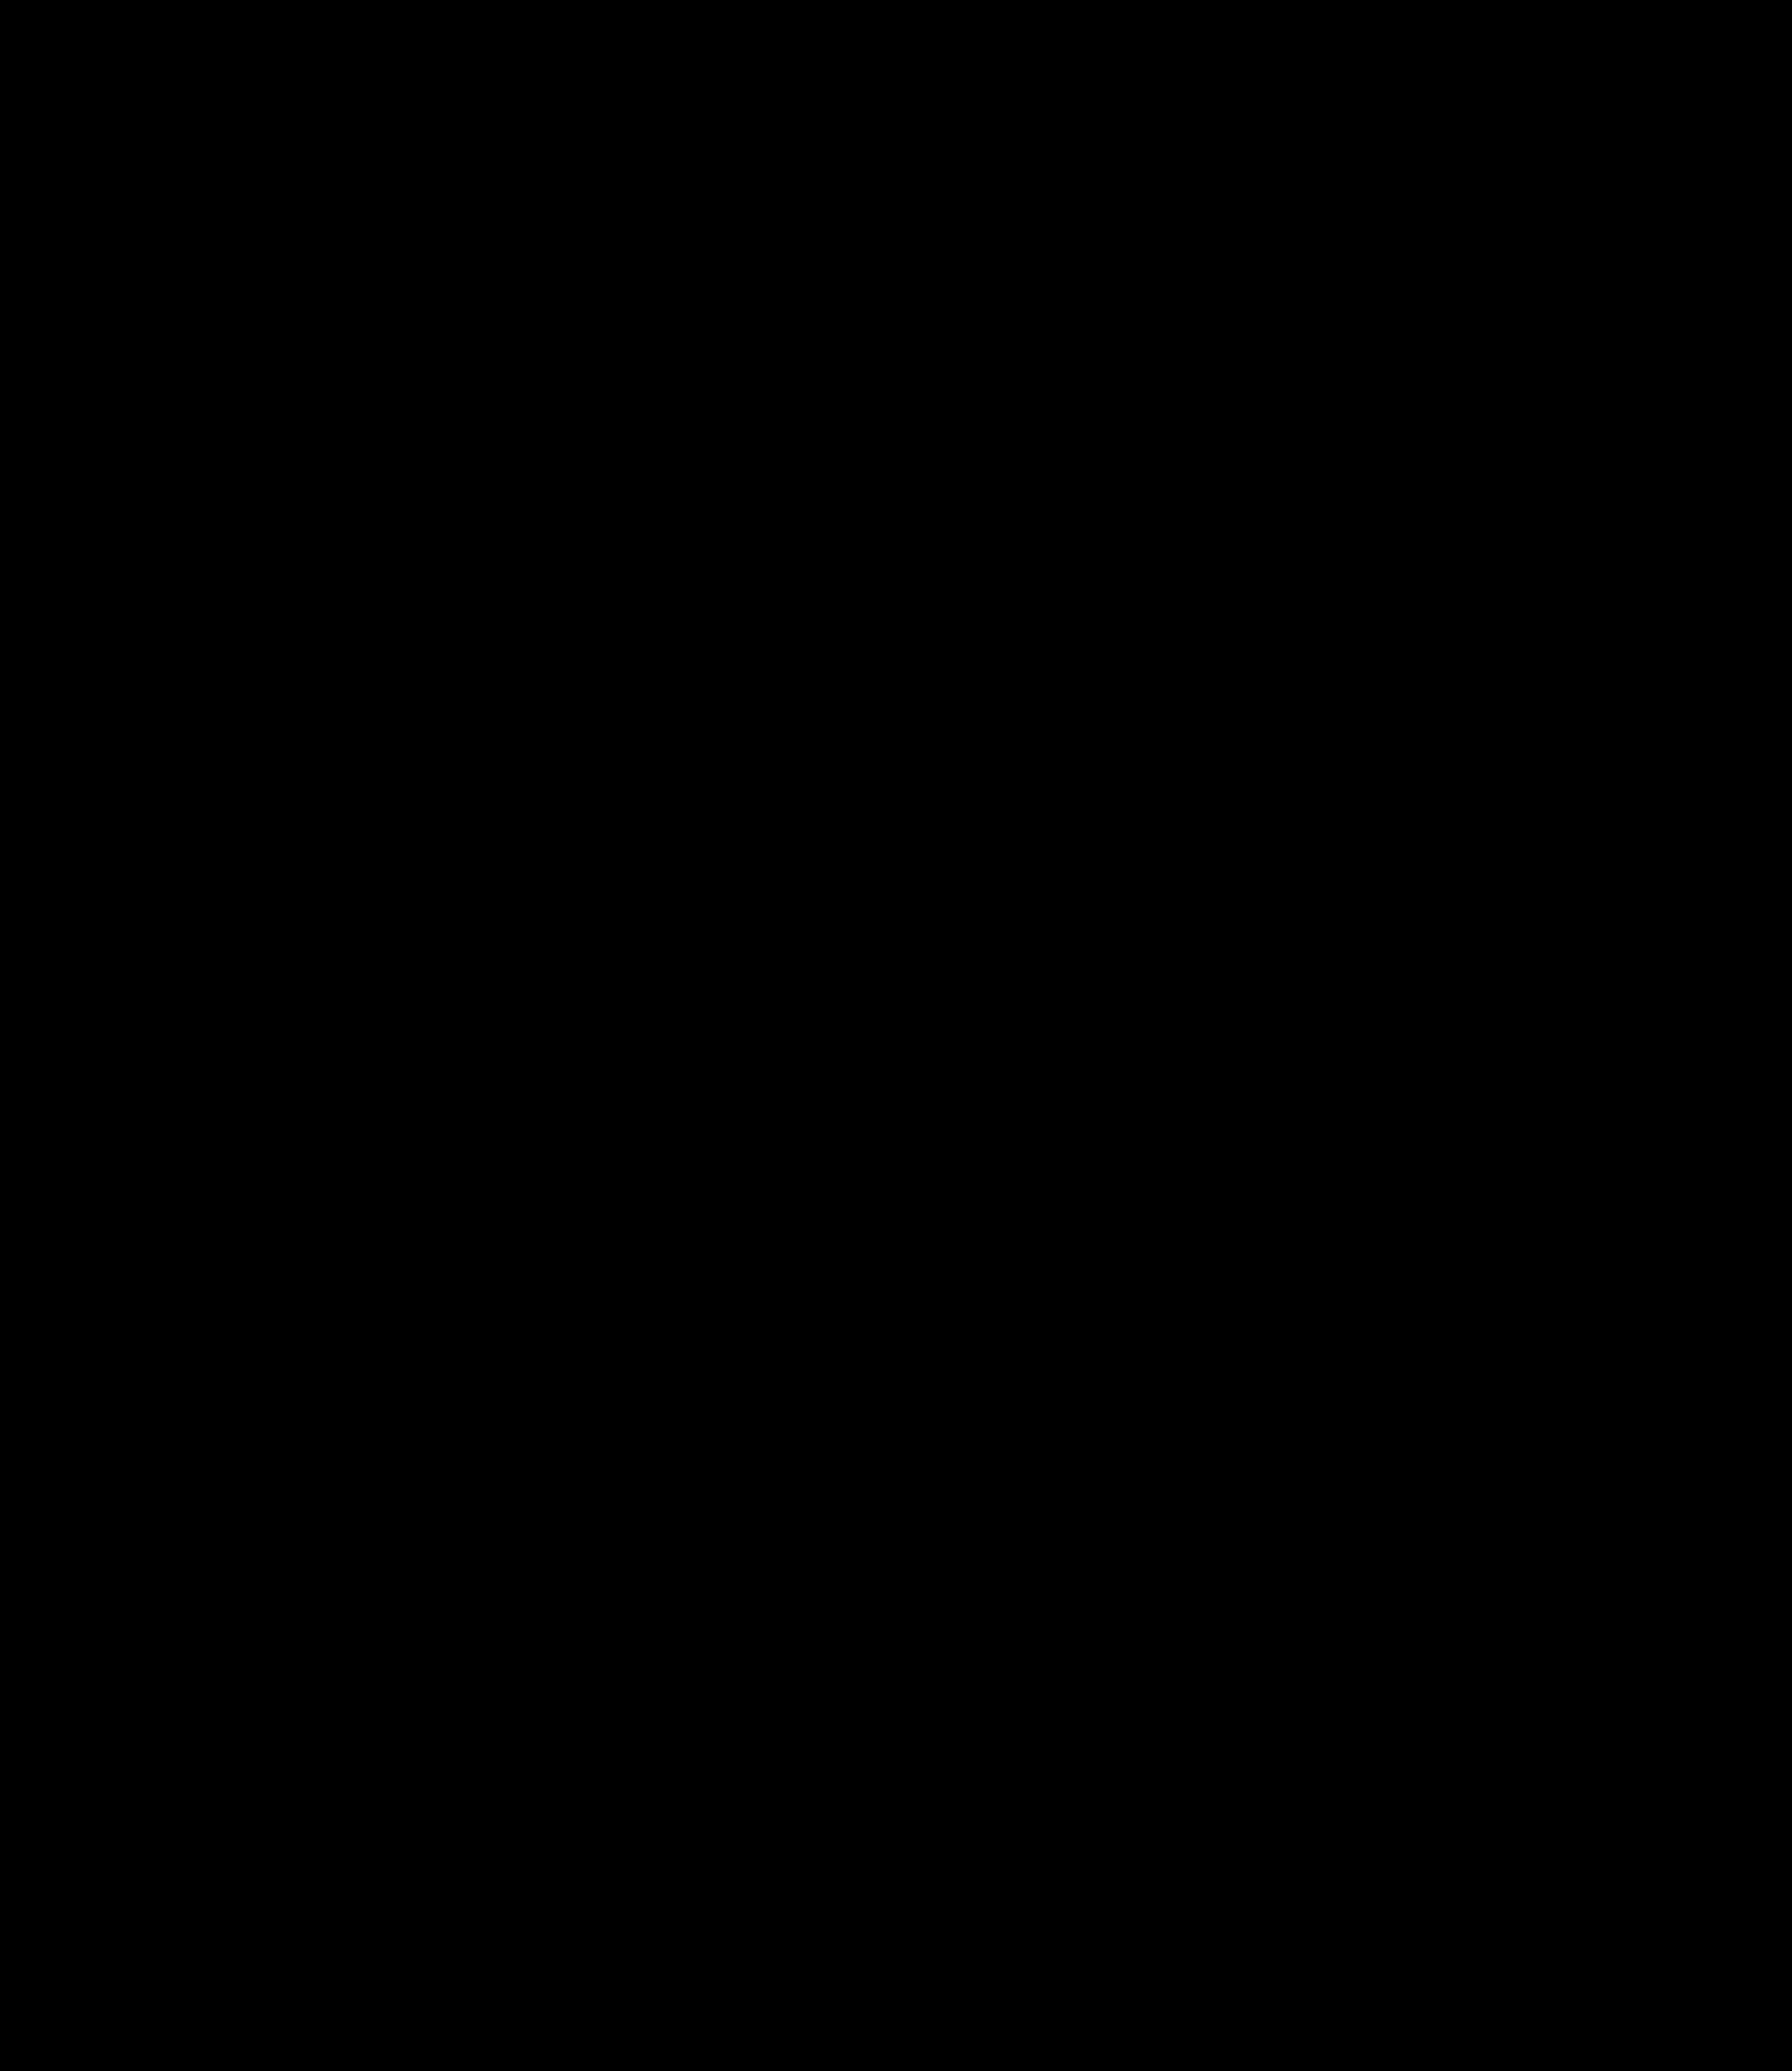 Filebattleship frontsvg wikimedia commons. Battleship clipart transparent background